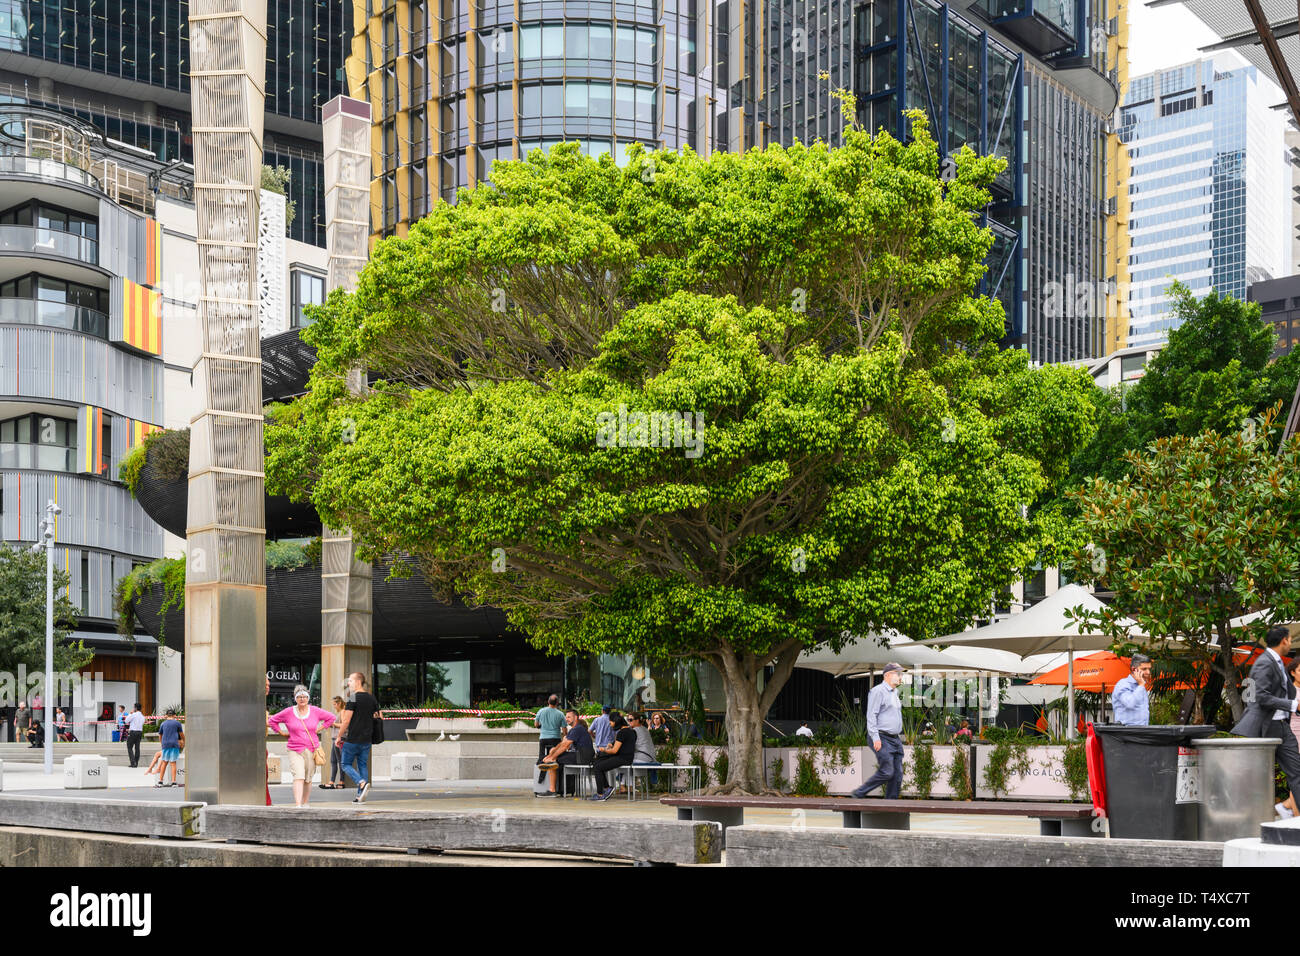 A tree near Darling Harbour Wharf 1, King Street Wharf, Sydney, New South Wales, Australia. Stock Photo